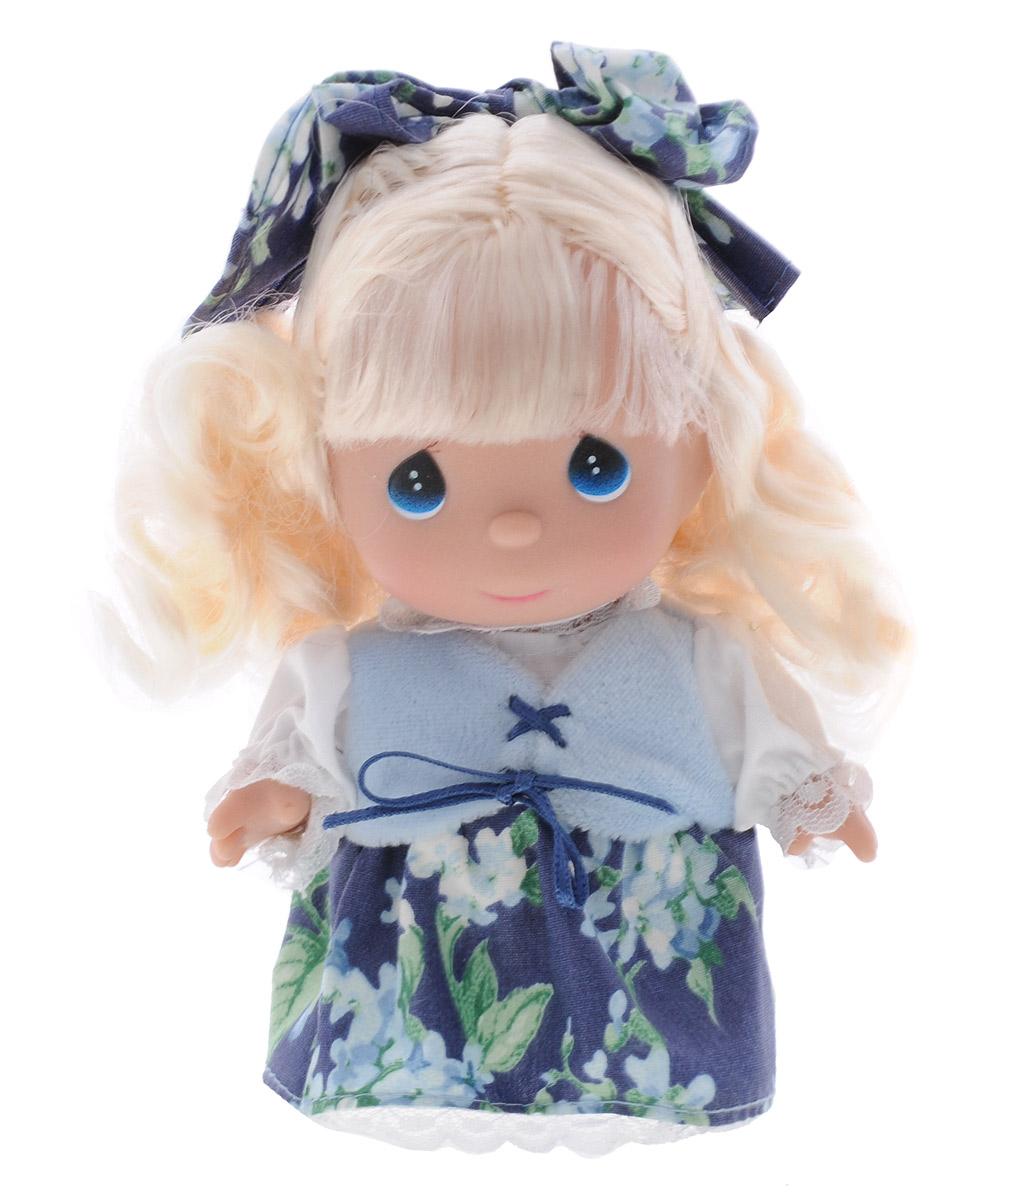 Precious Moments Мини-кукла Лютик золотистый precious moments мини кукла бабочка цвет наряда розовый сиреневый